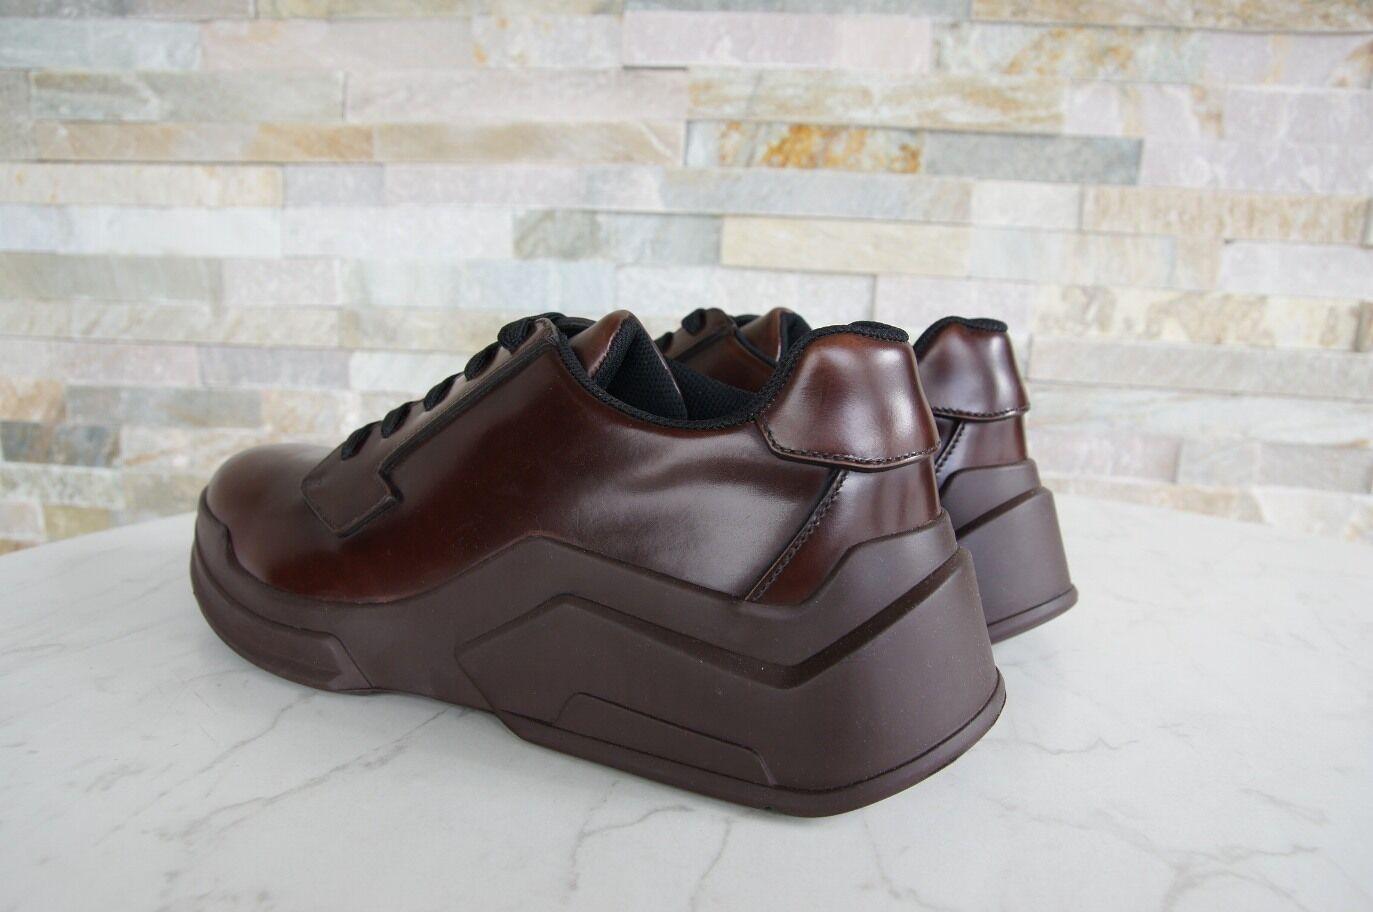 PRADA Gr Sneaker 40 6 Herren Schnürschuhe Sneaker Gr Halbschuhe Schuhe bruciato NEU UVP550 57cabd